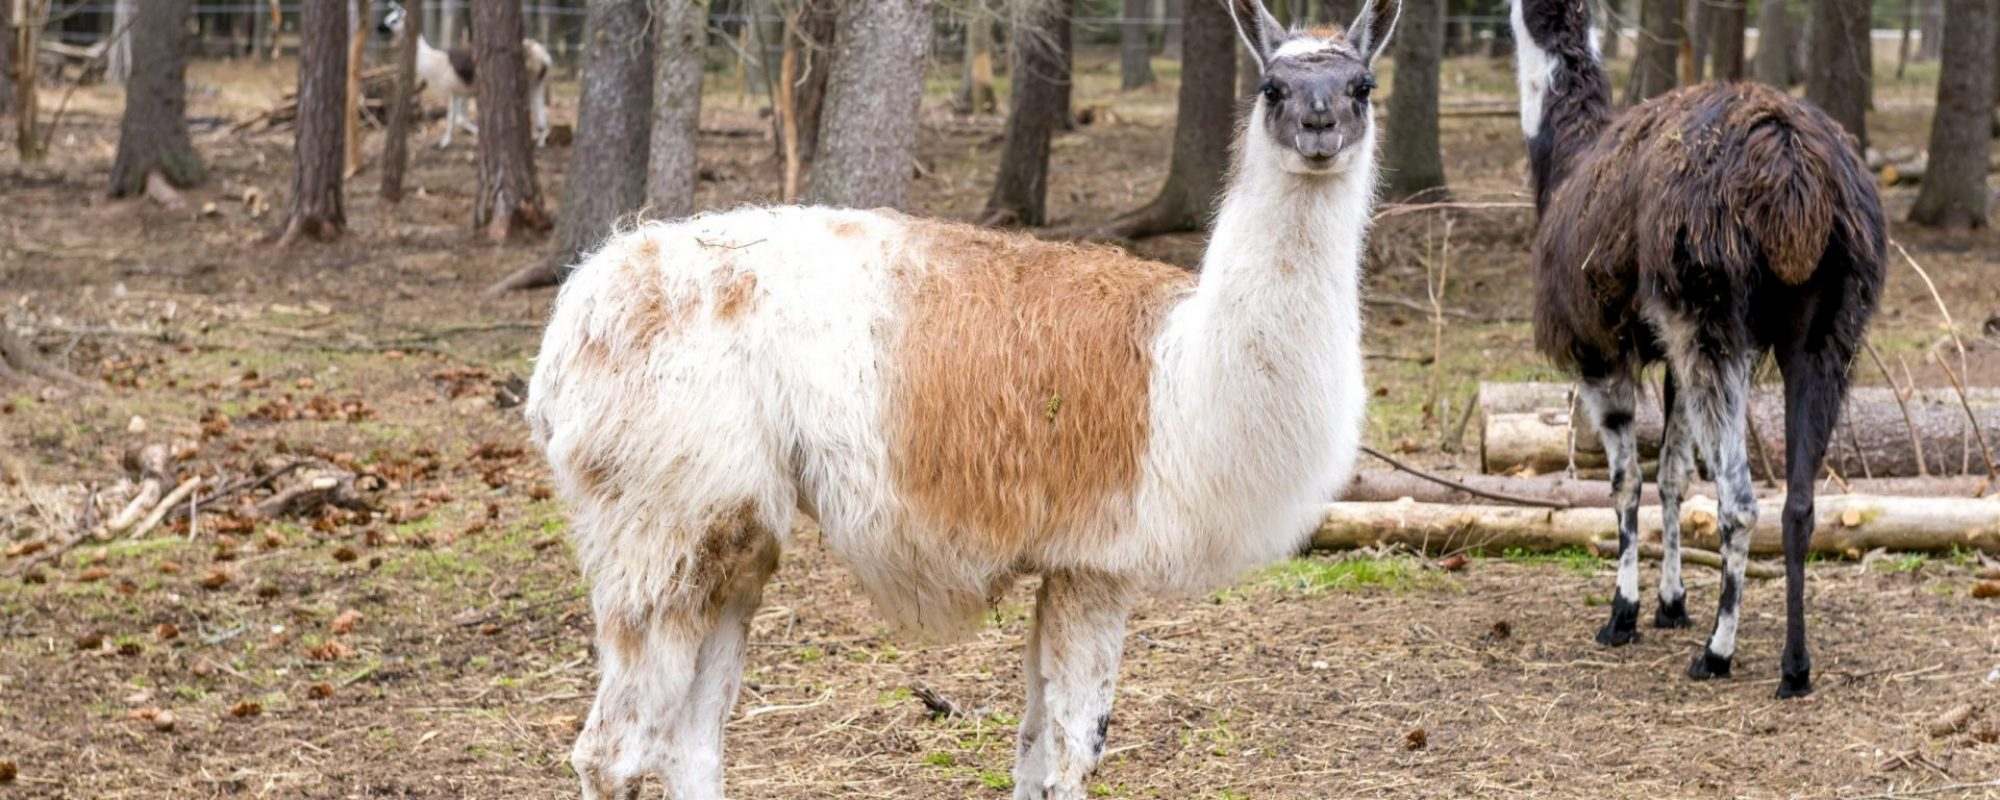 Gotlandsdjurpark-kaldhage-djur-516